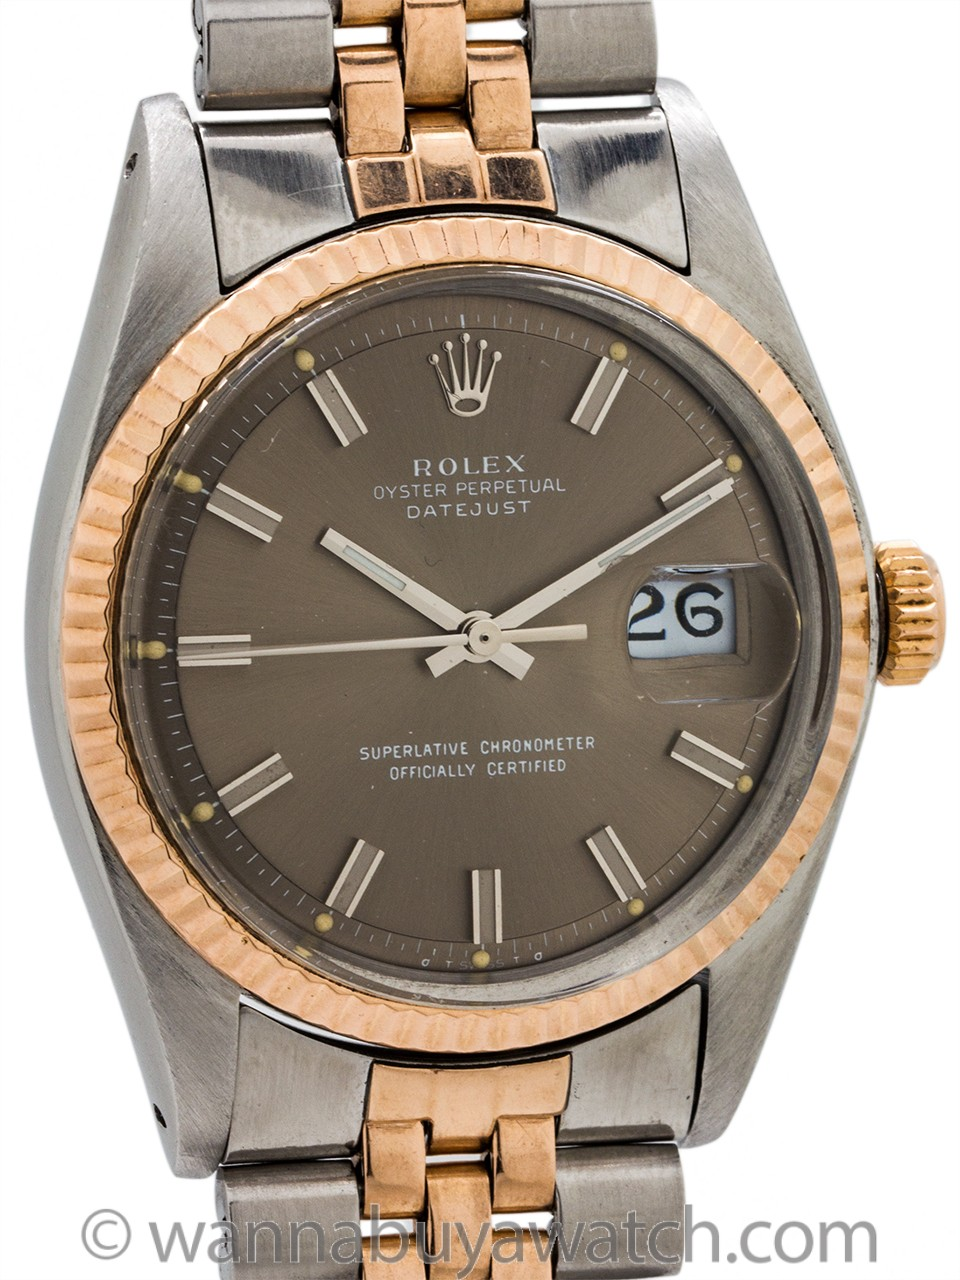 Rolex SS/14K Rose Gold Datejust ref 1601 circa 1969